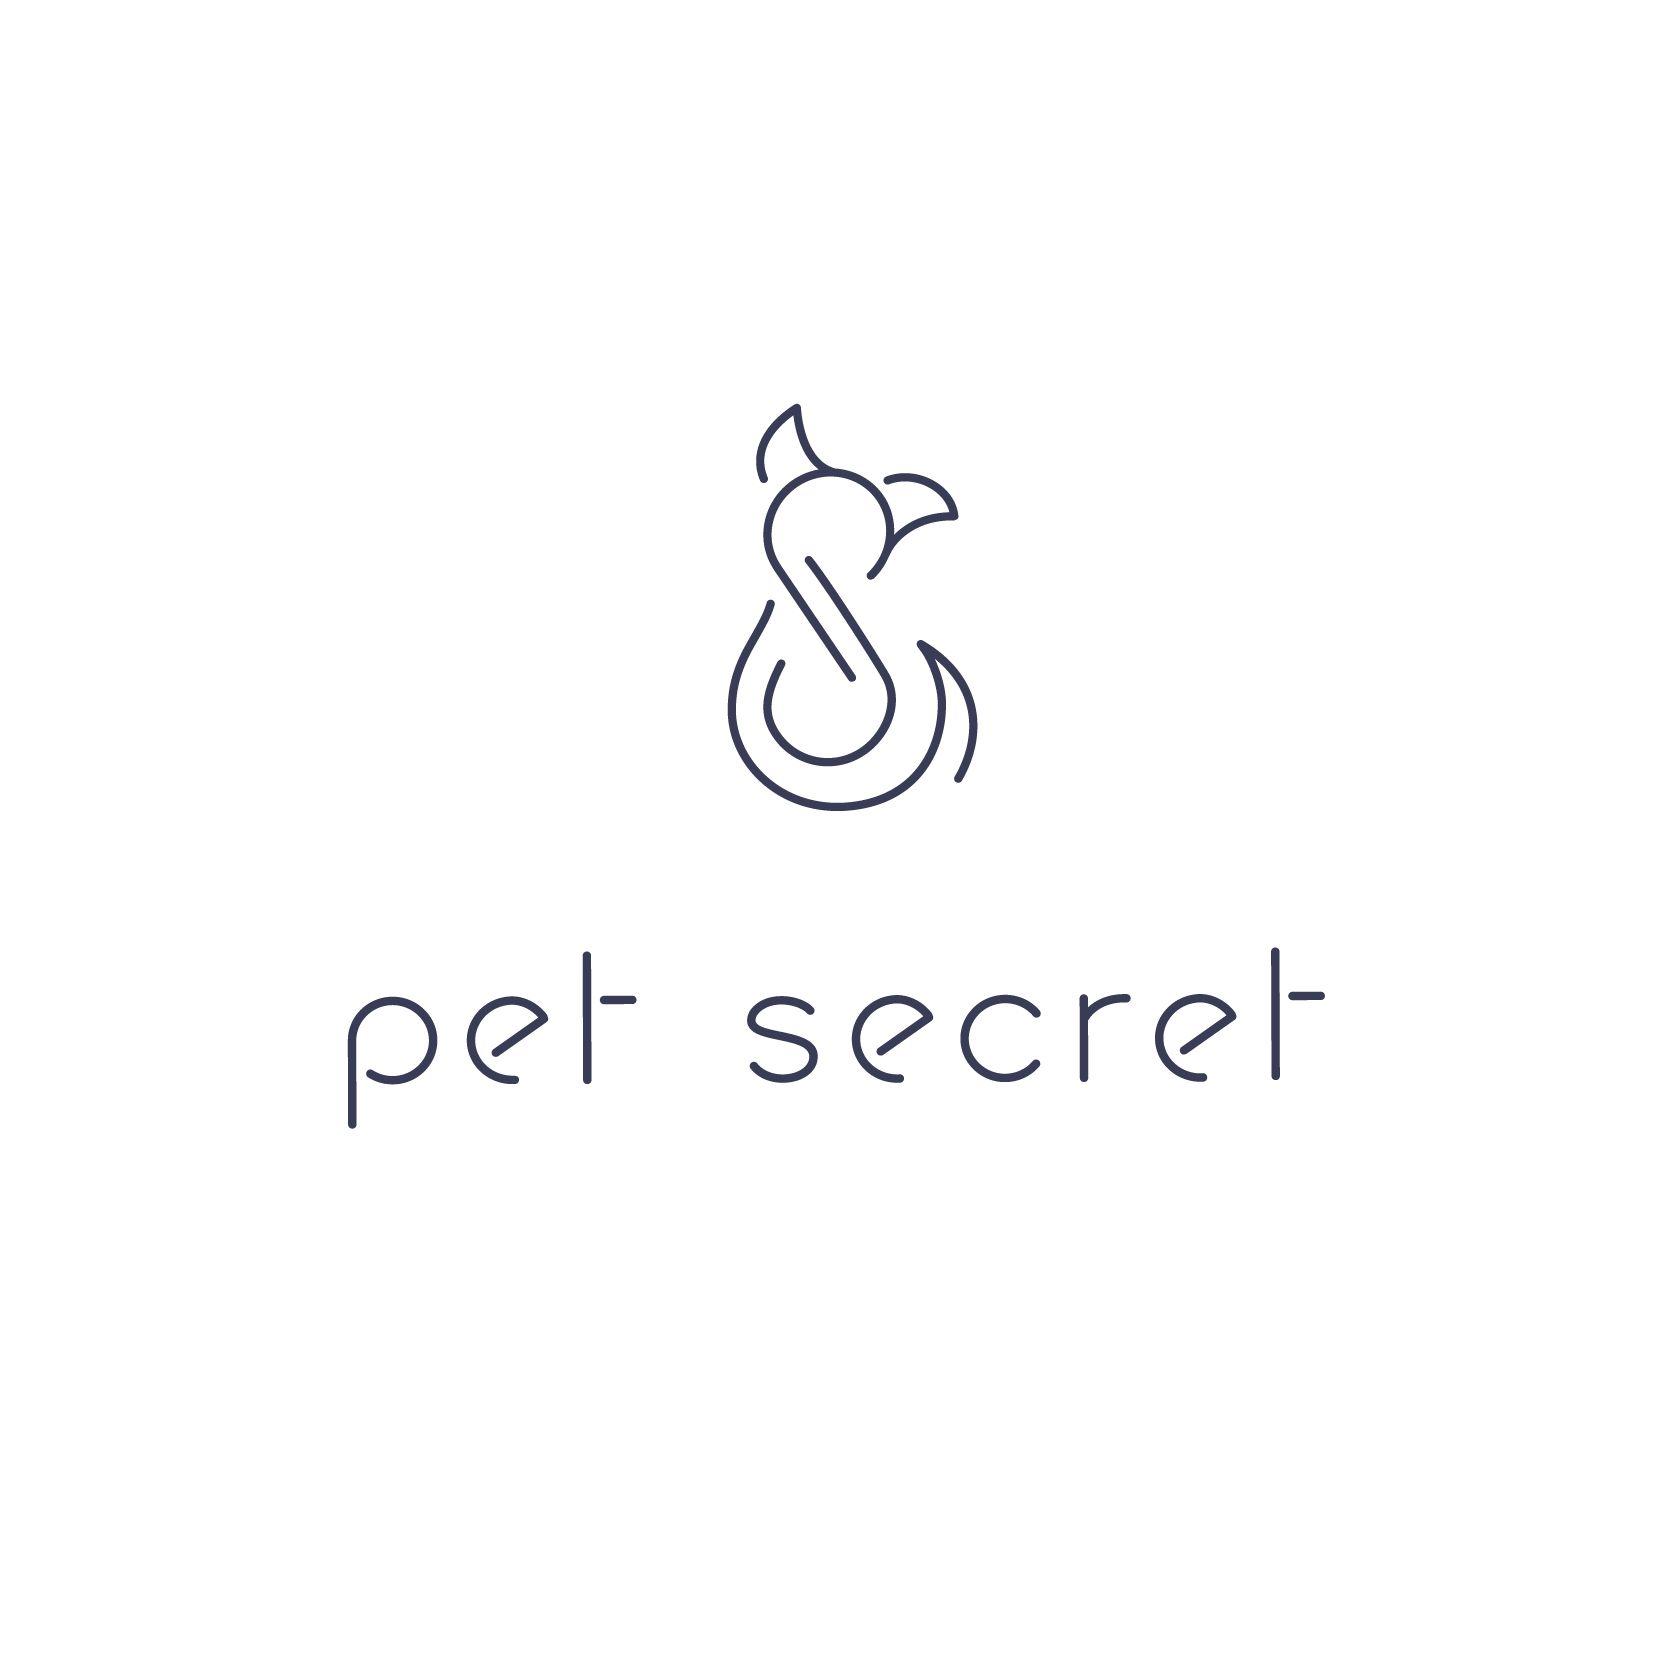 Pet Secret logo